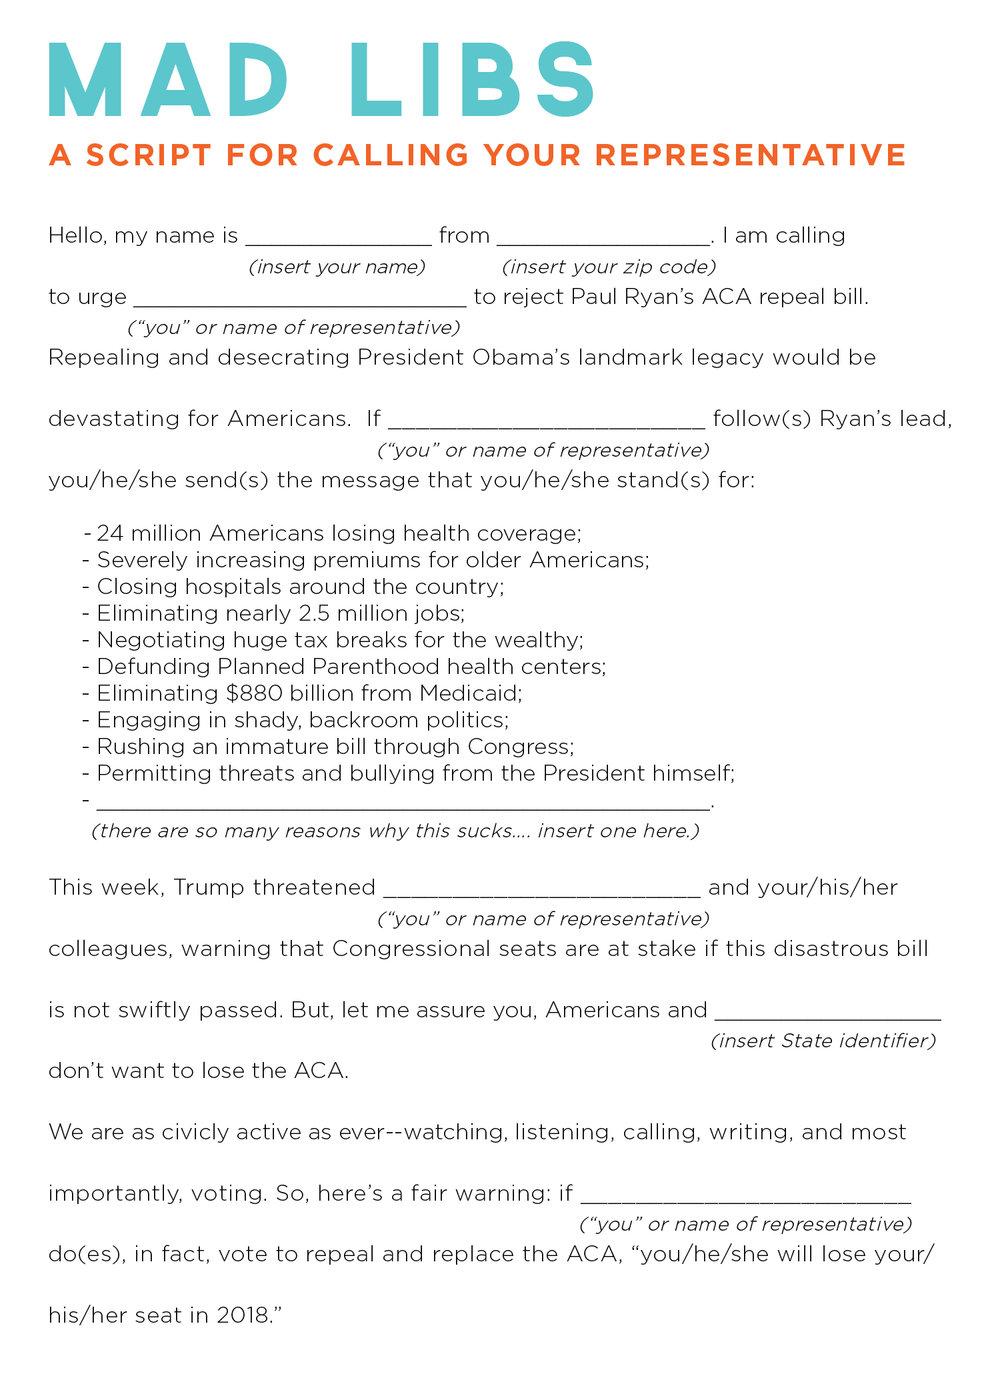 Mad Lib - ACA 3.22.17.jpg